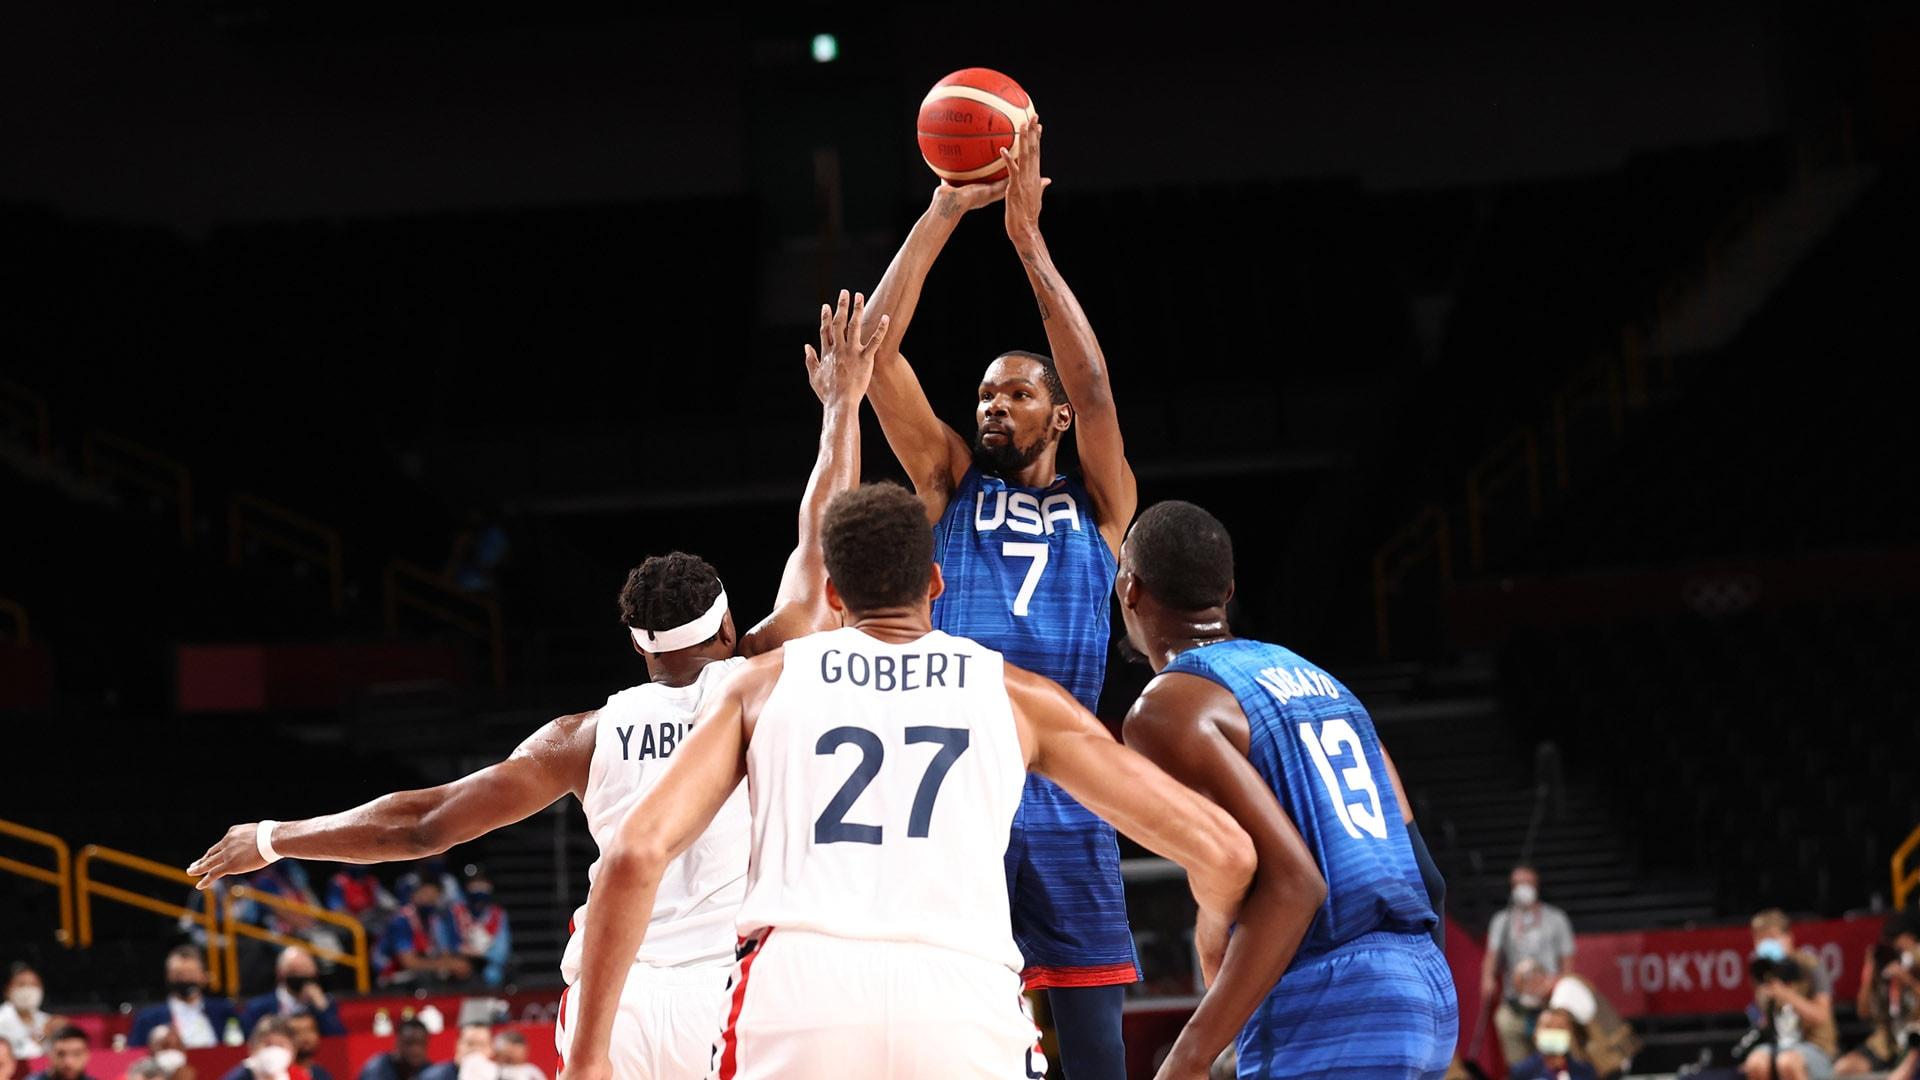 USA vs. France: Who has edge in gold medal showdown?